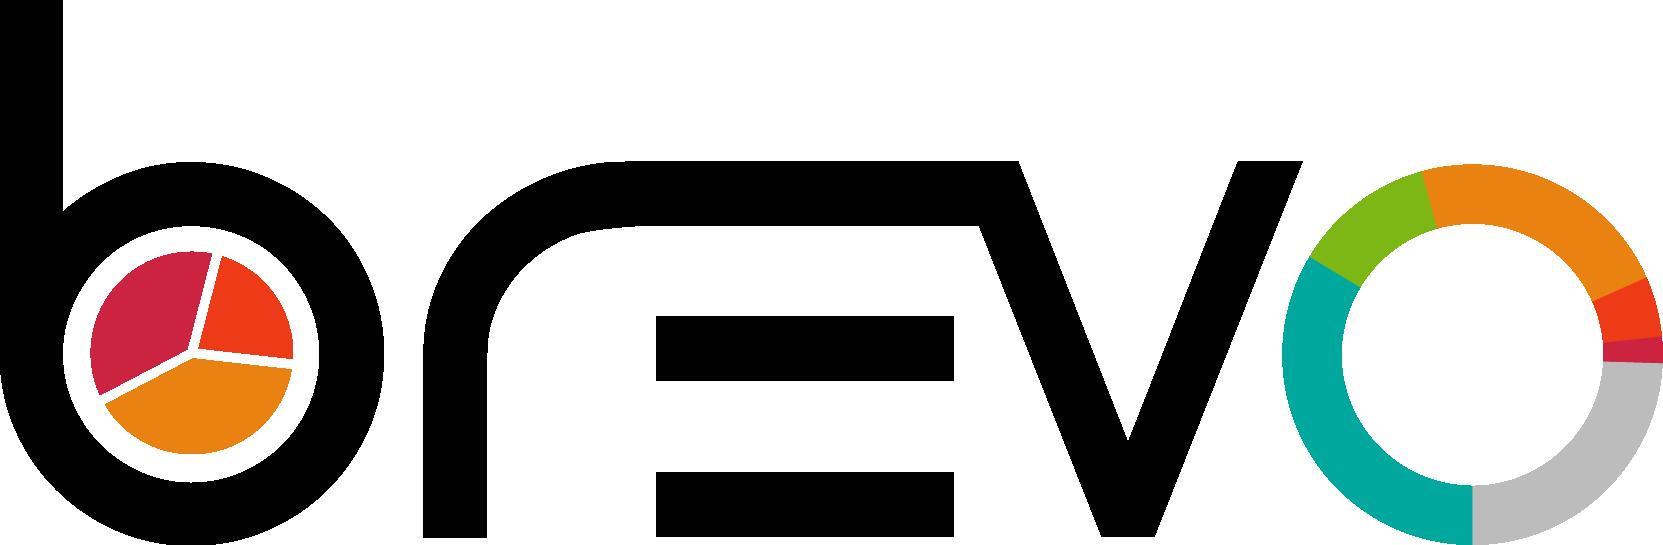 brevo